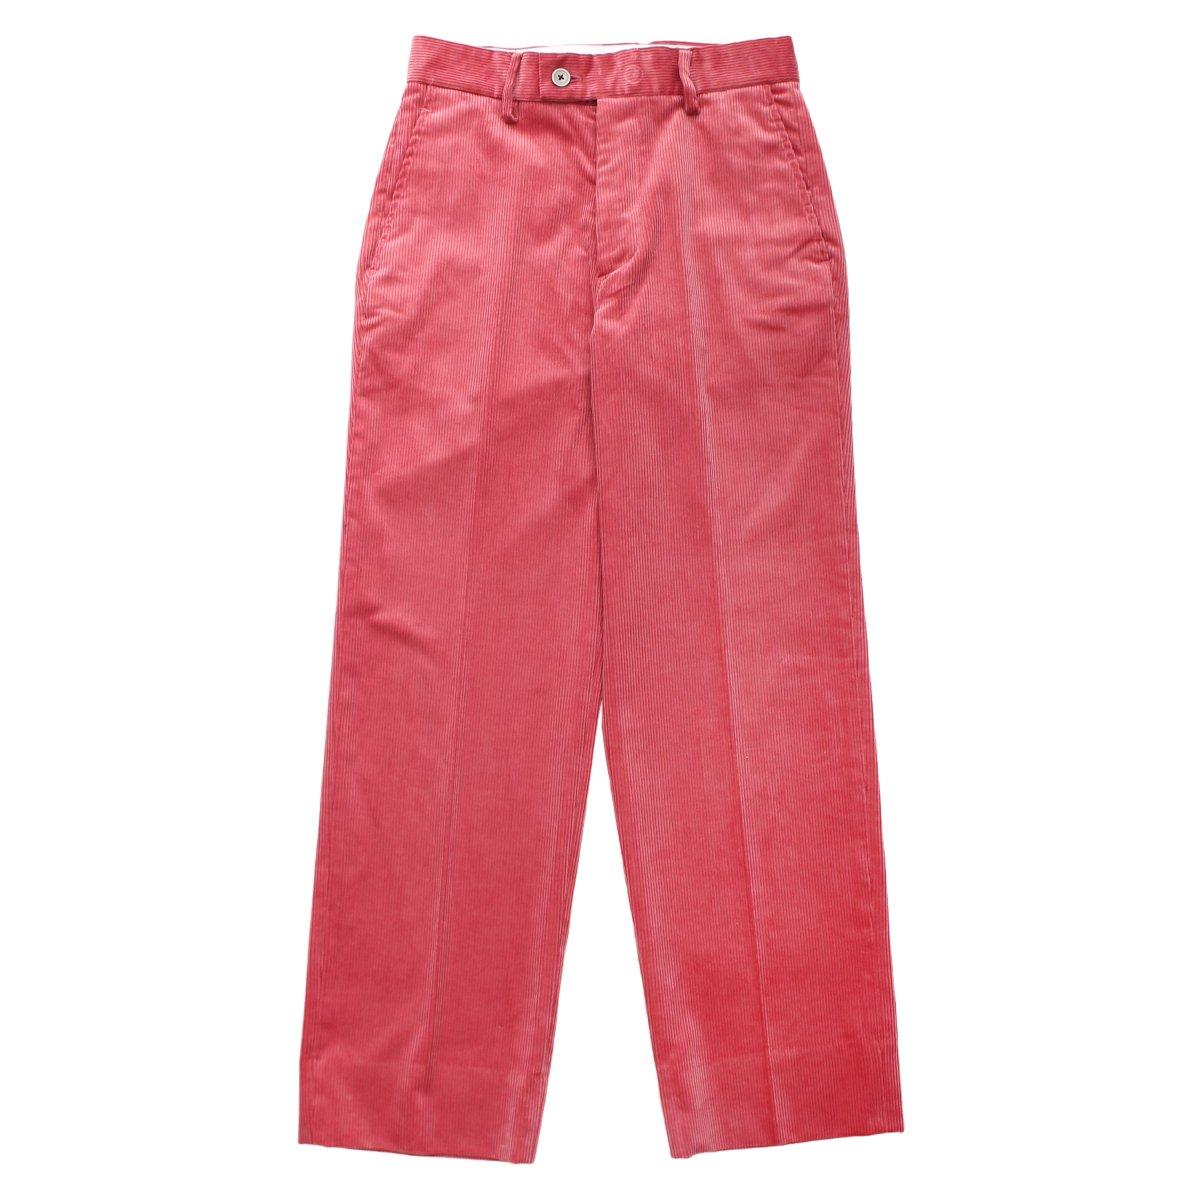 Corduroy 5pkt Pants【PINK】